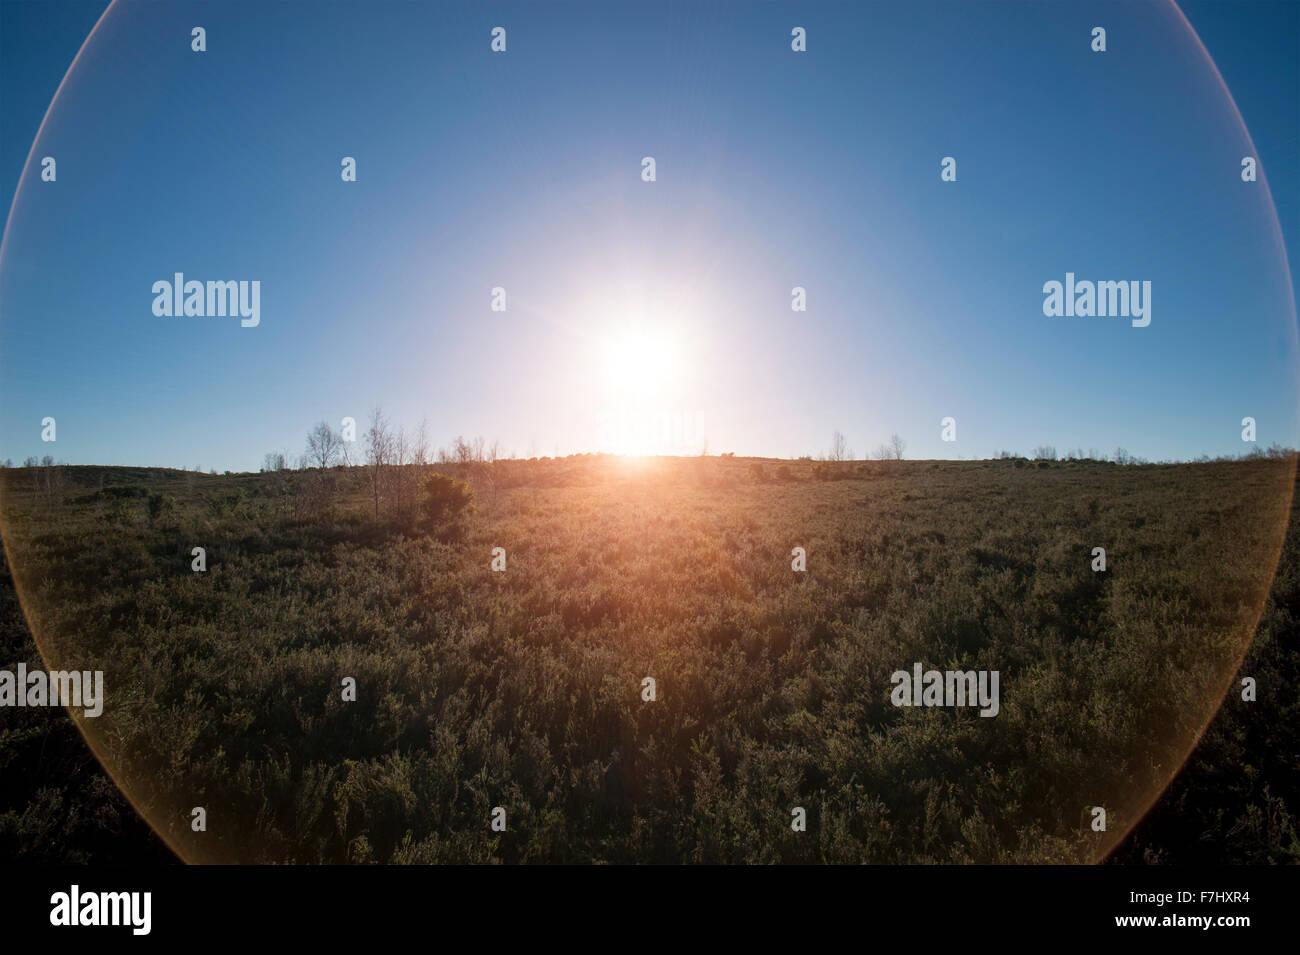 circular lens flare - Stock Image